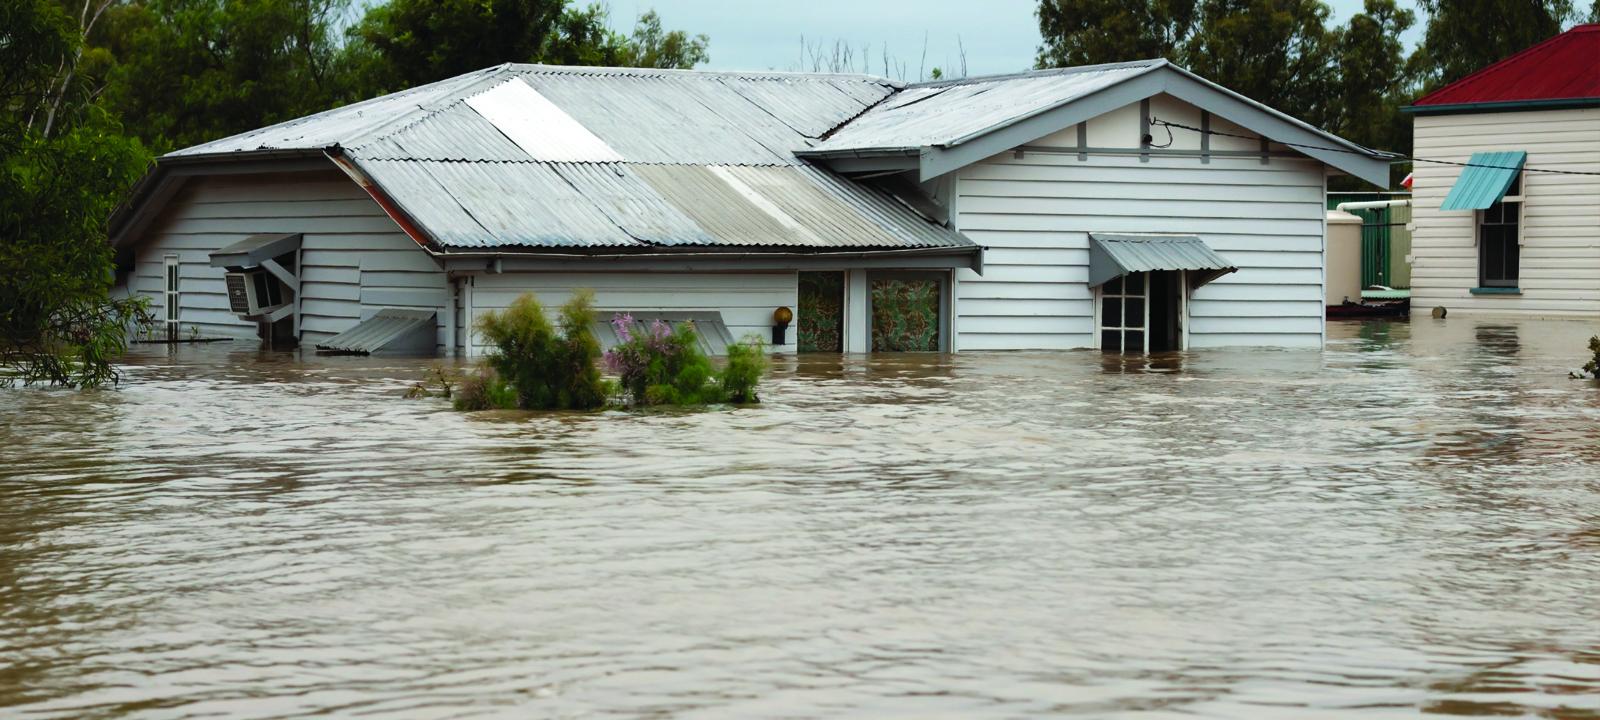 Louisiana Flood Relief